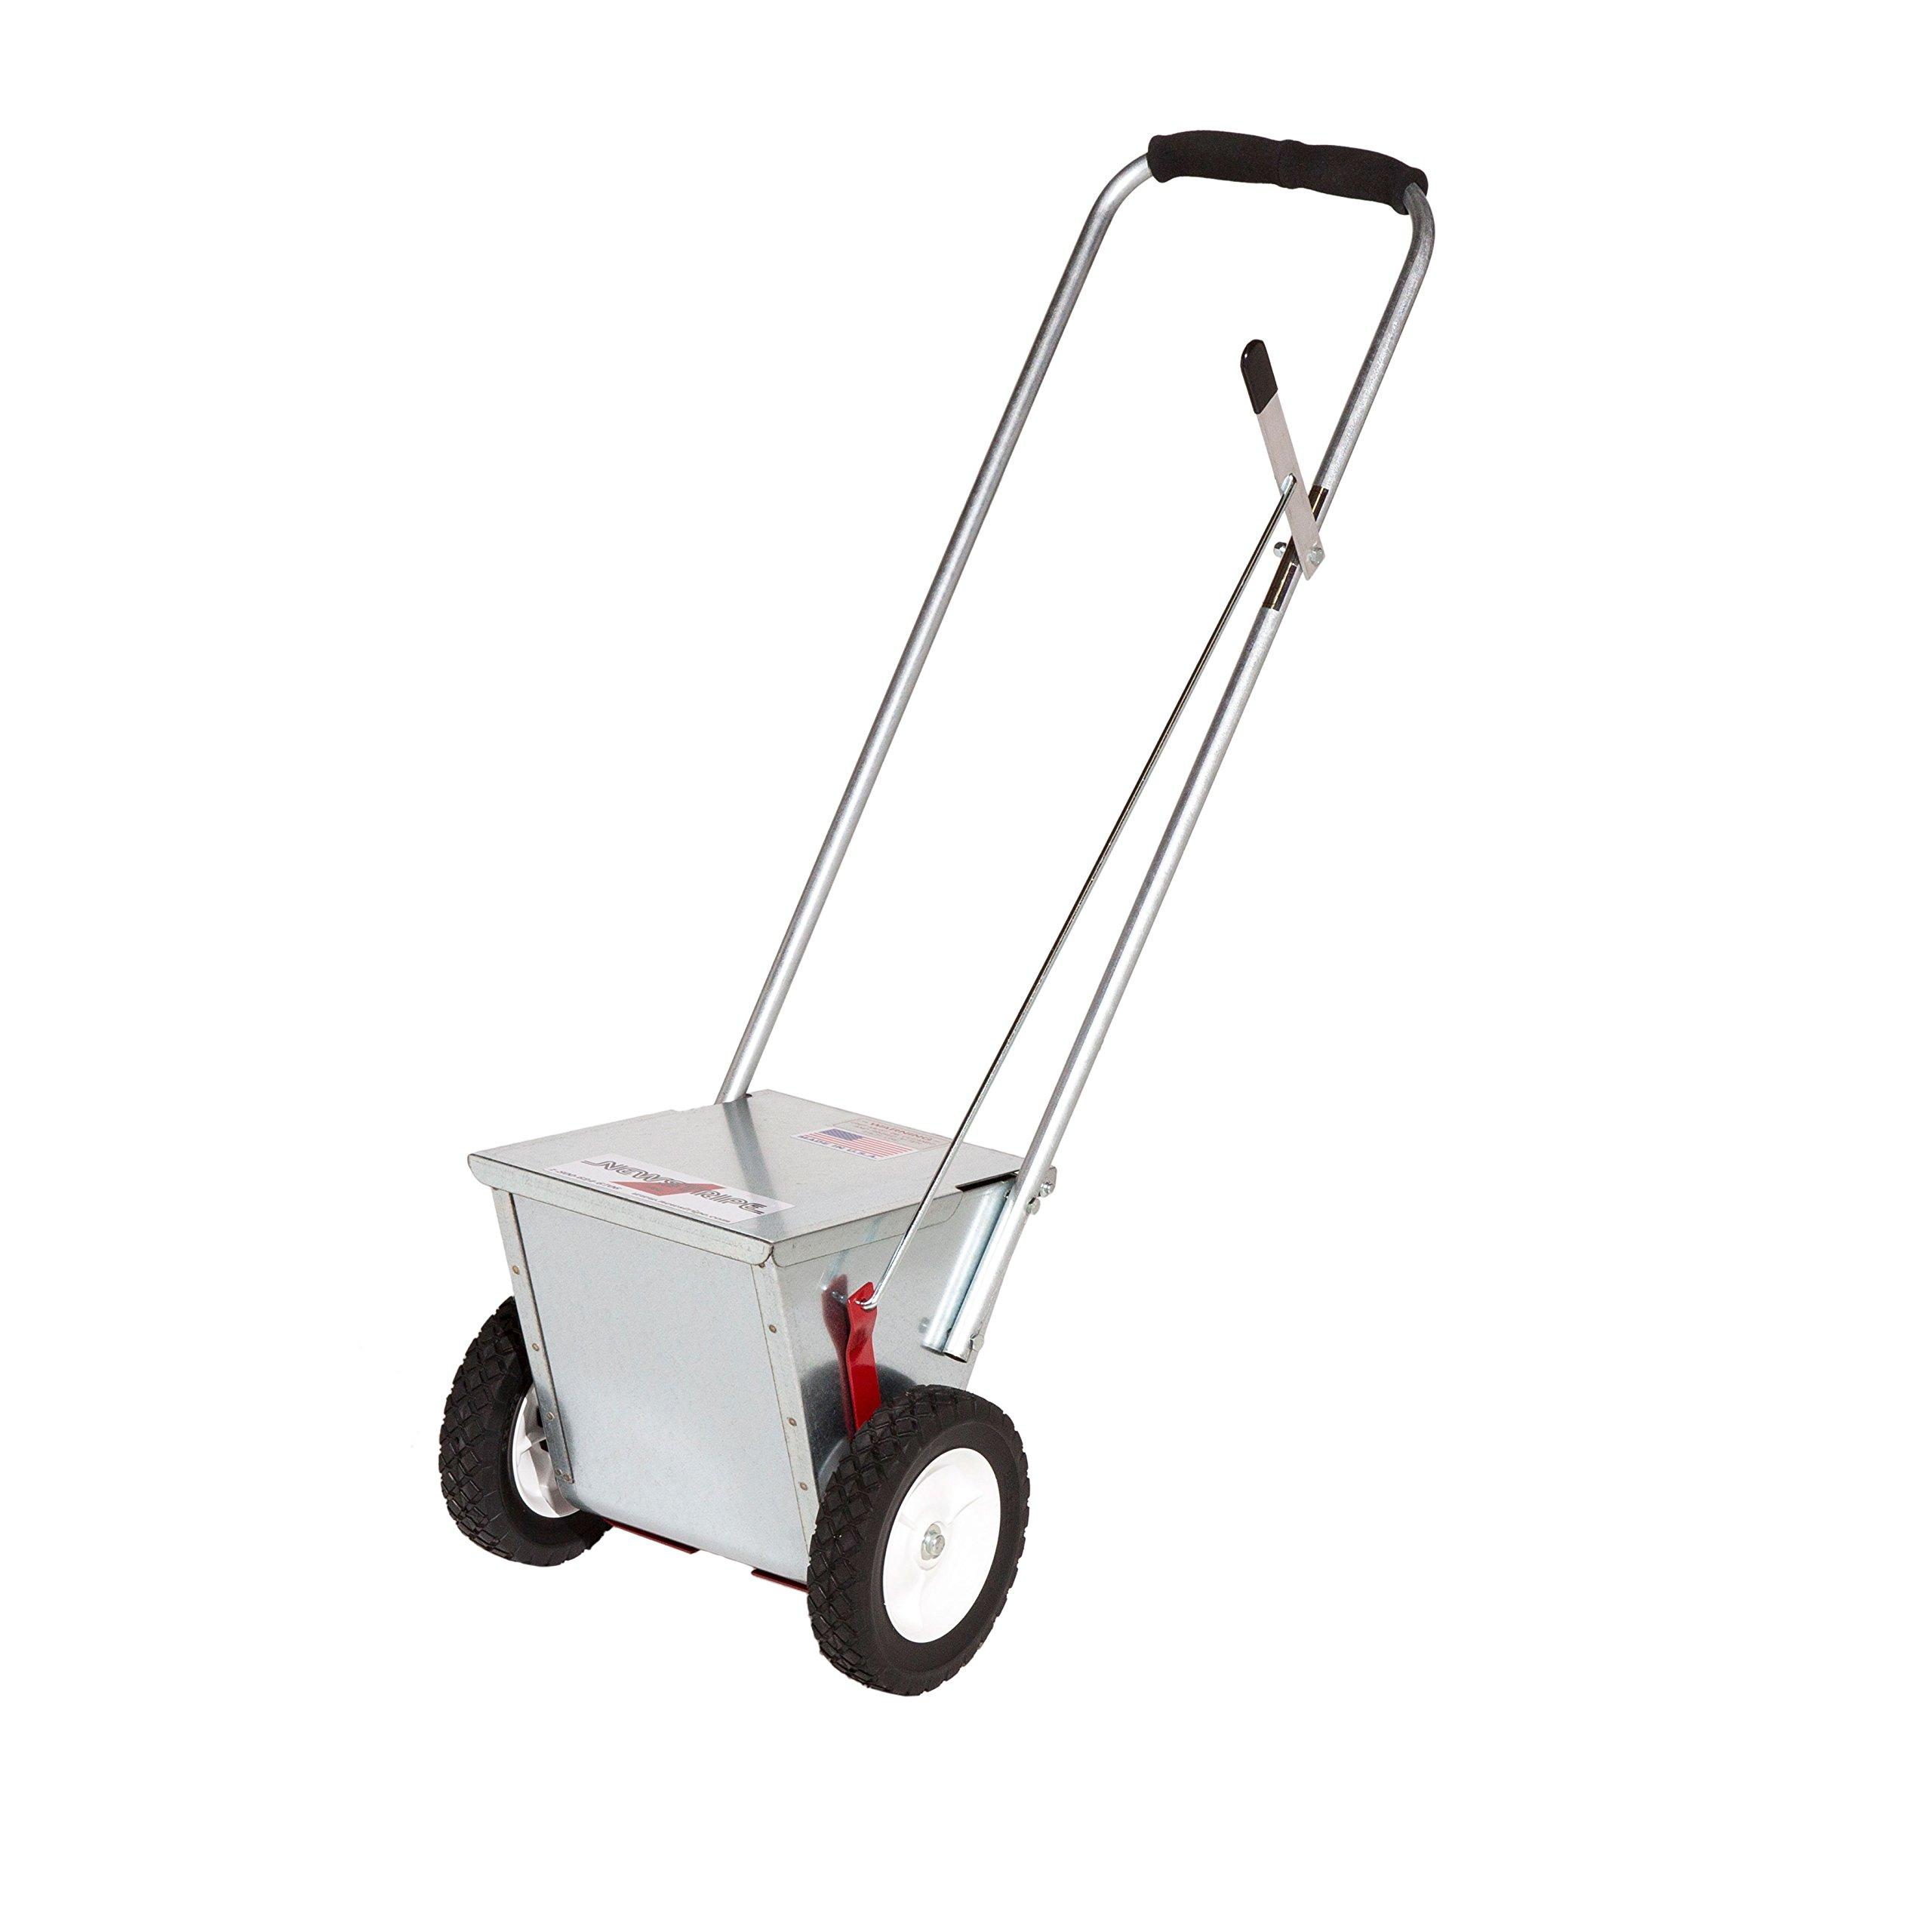 NewLiner 25 lb. 2 Wheel Dry Line Marker